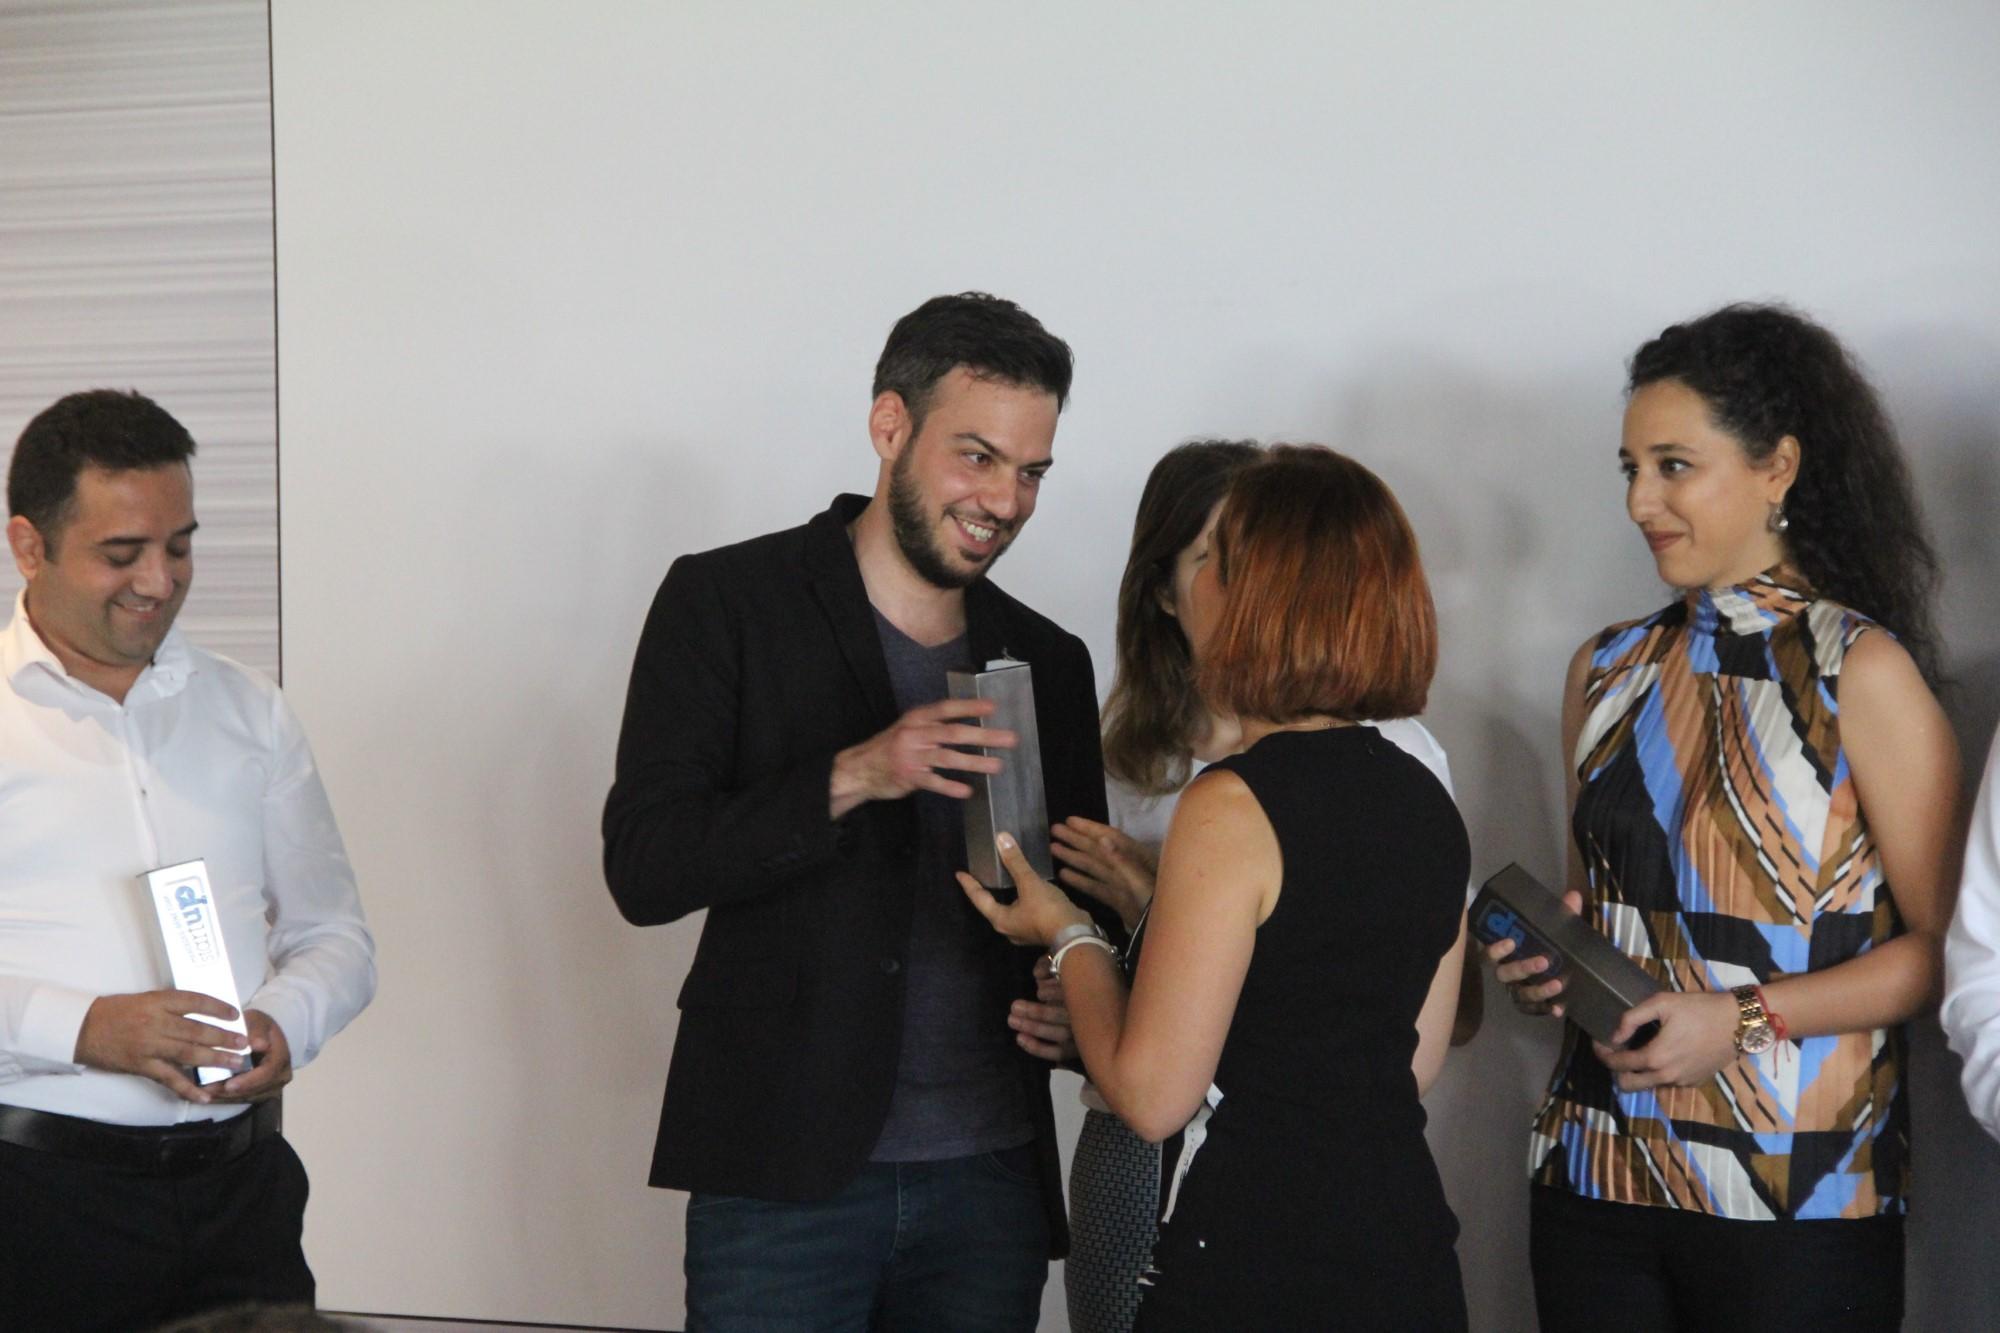 mercedes-start-up-odul-toreni-2019-kazananlari.jpg